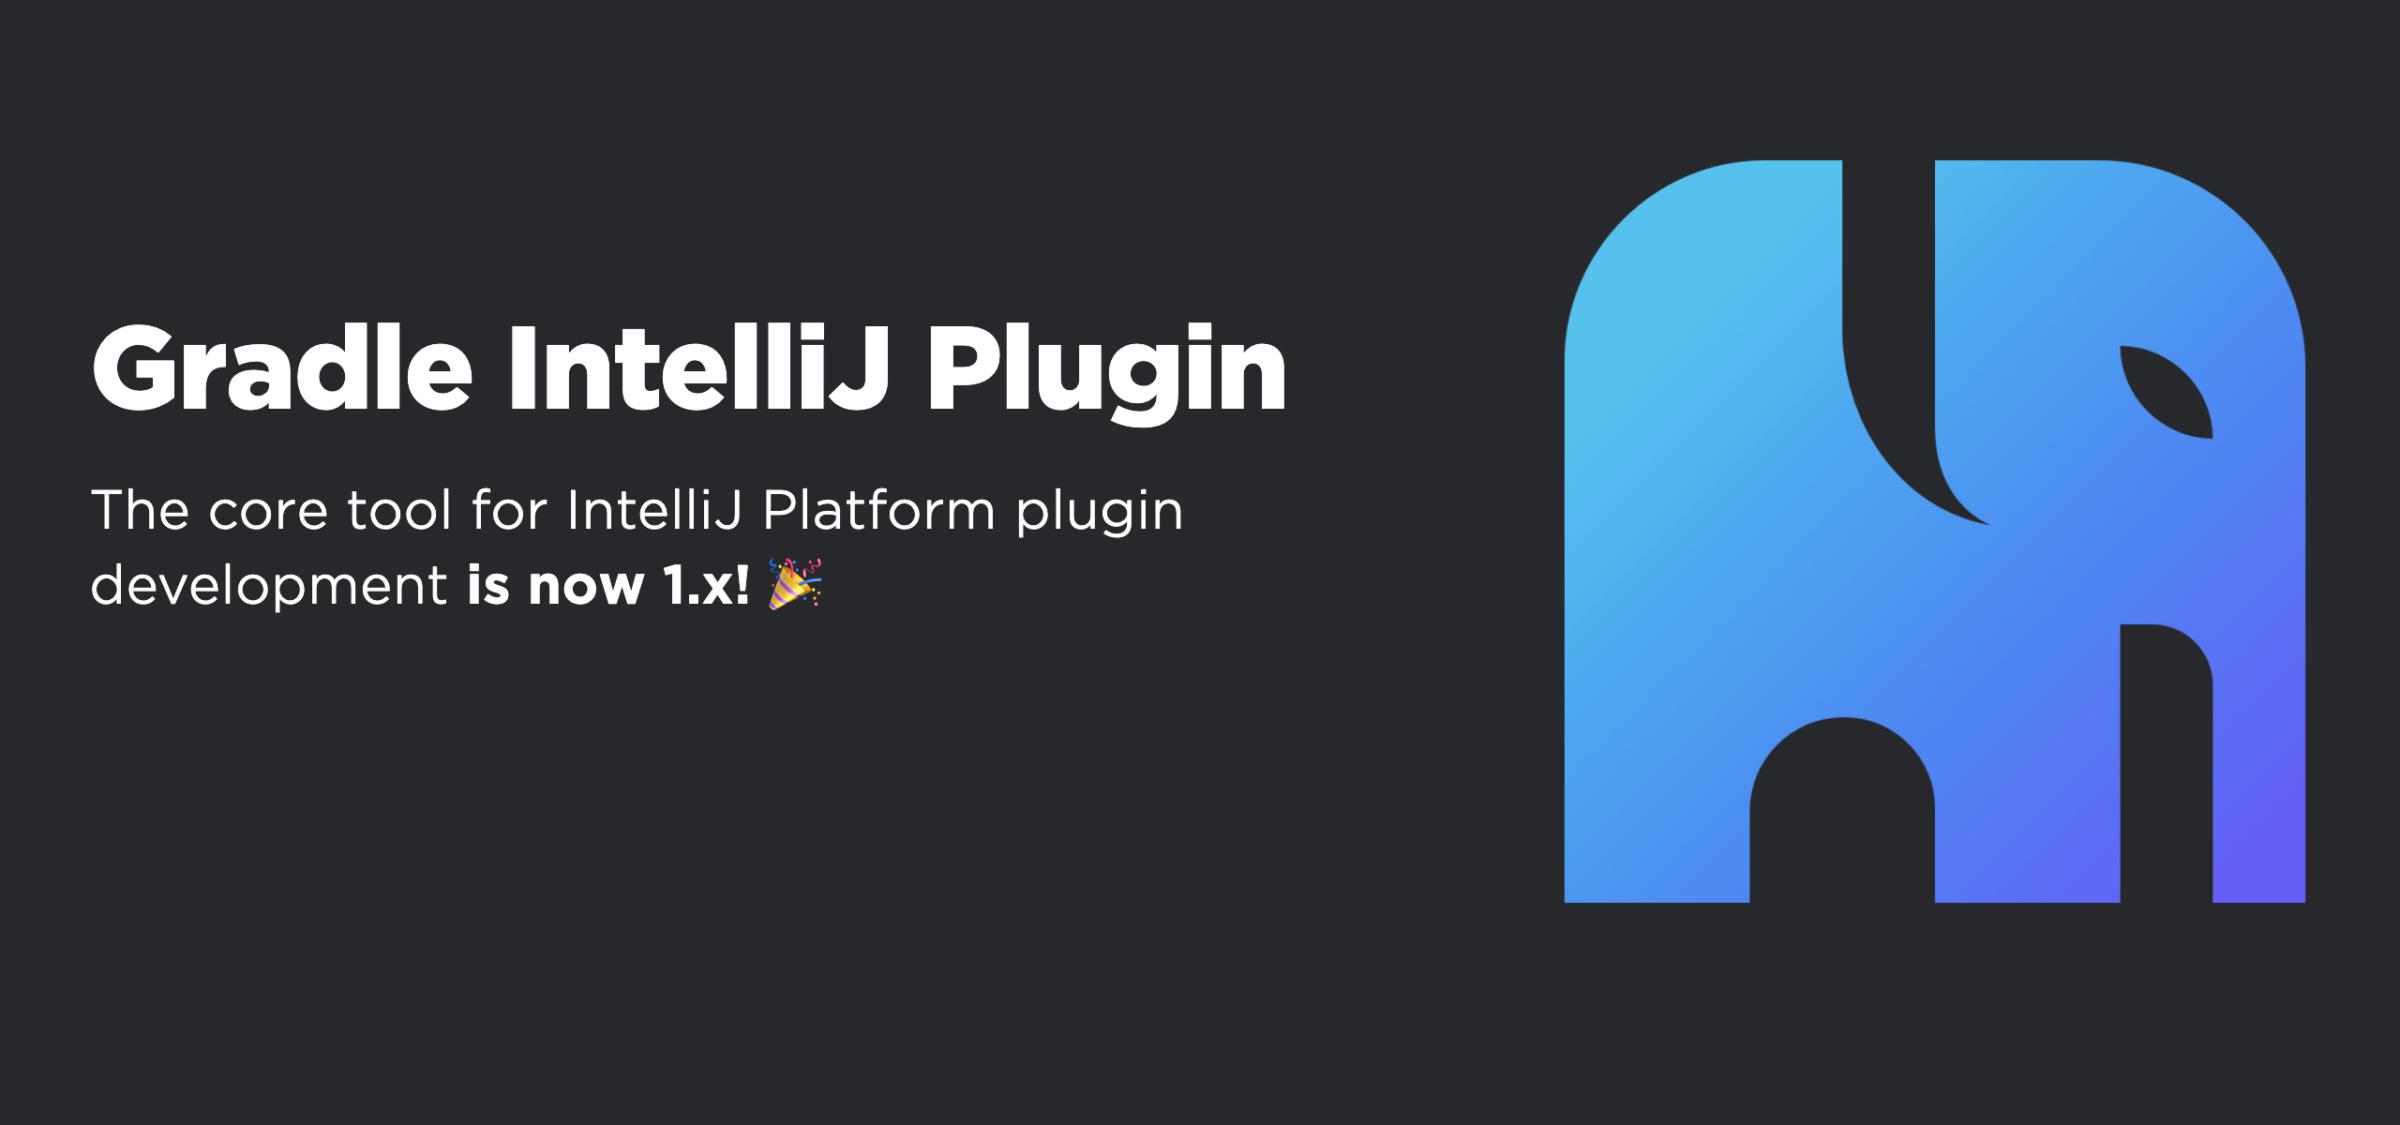 The Gradle IntelliJ Plugin